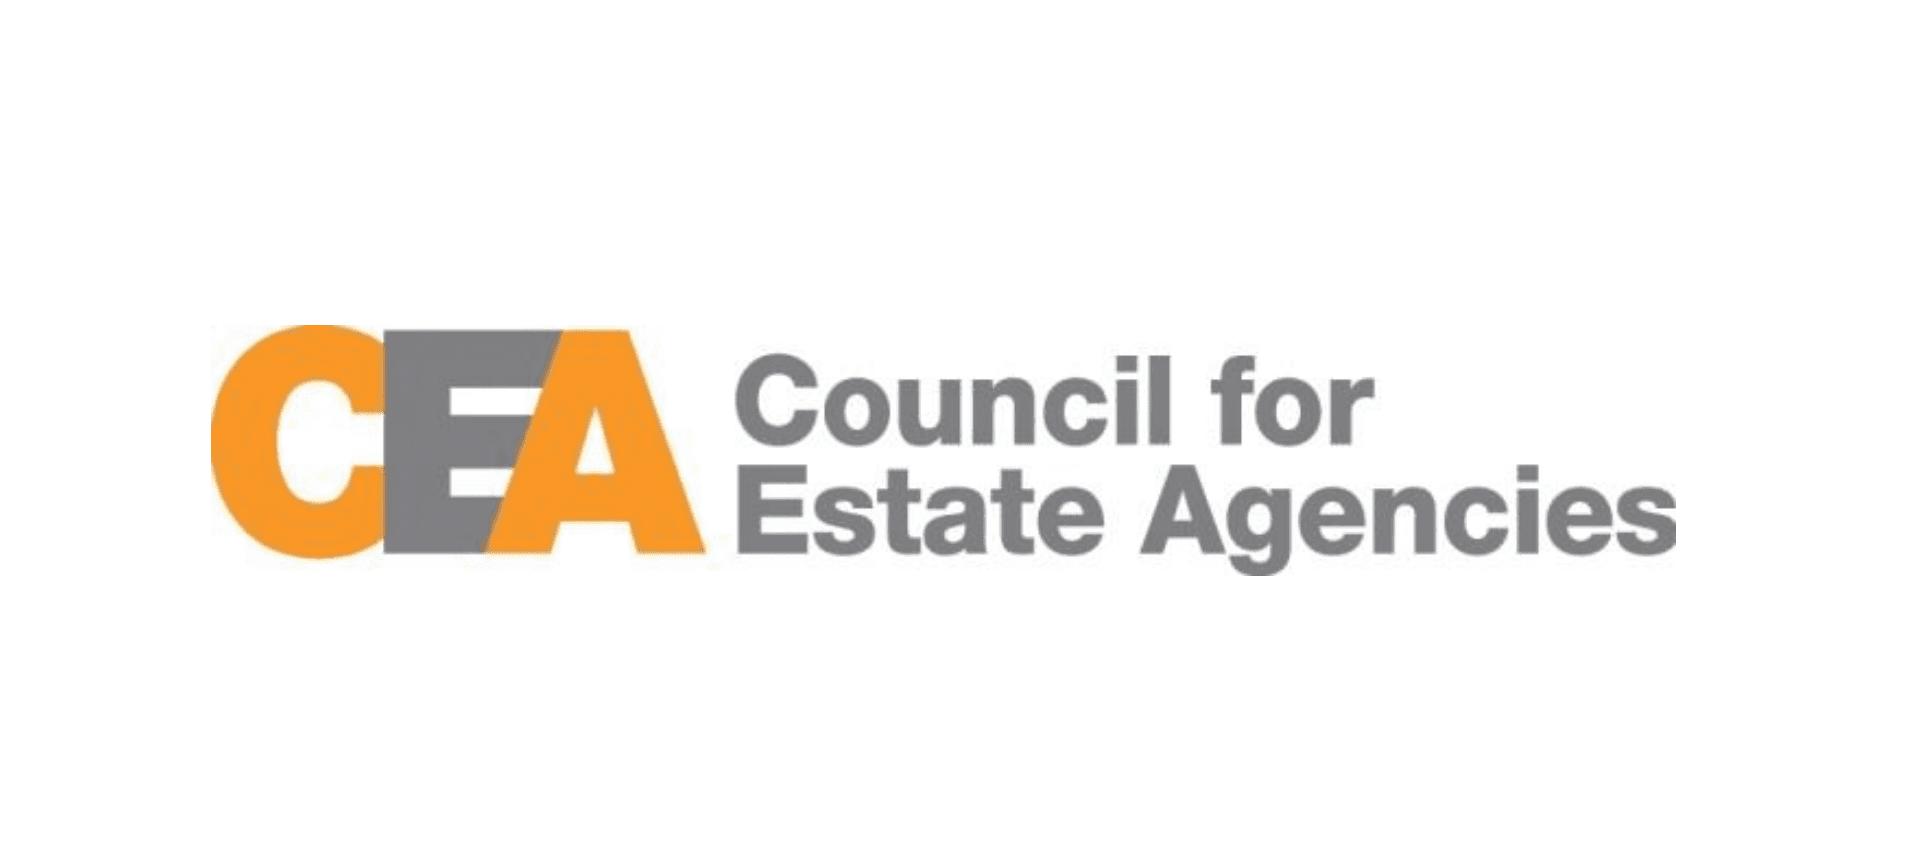 Council of Estate Agencies